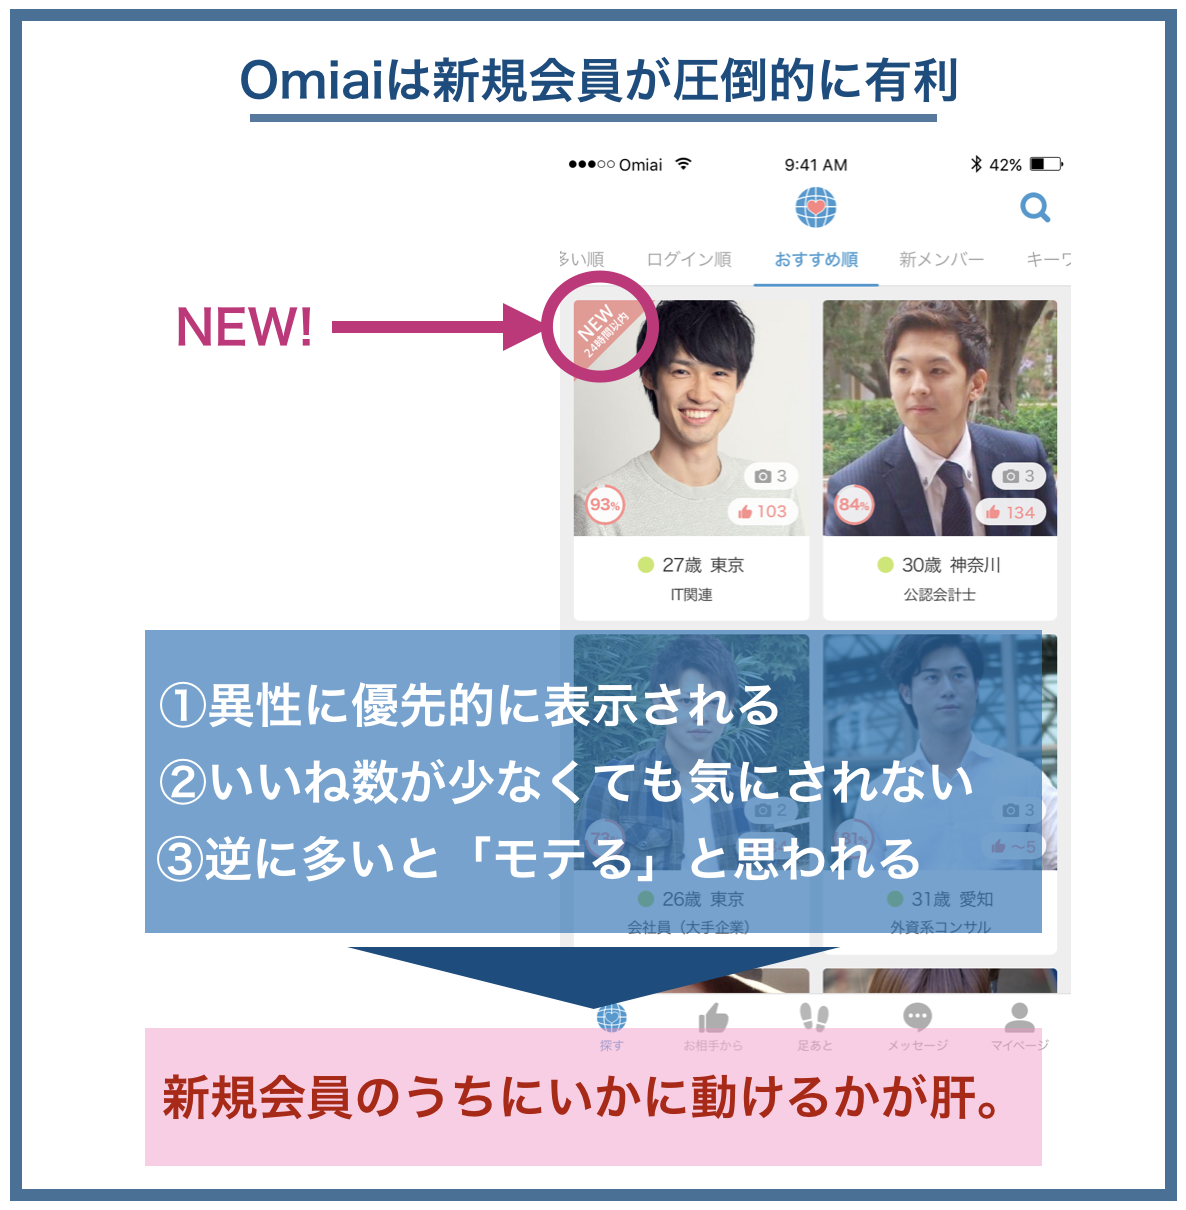 Omiaiは新規会員が圧倒的に有利